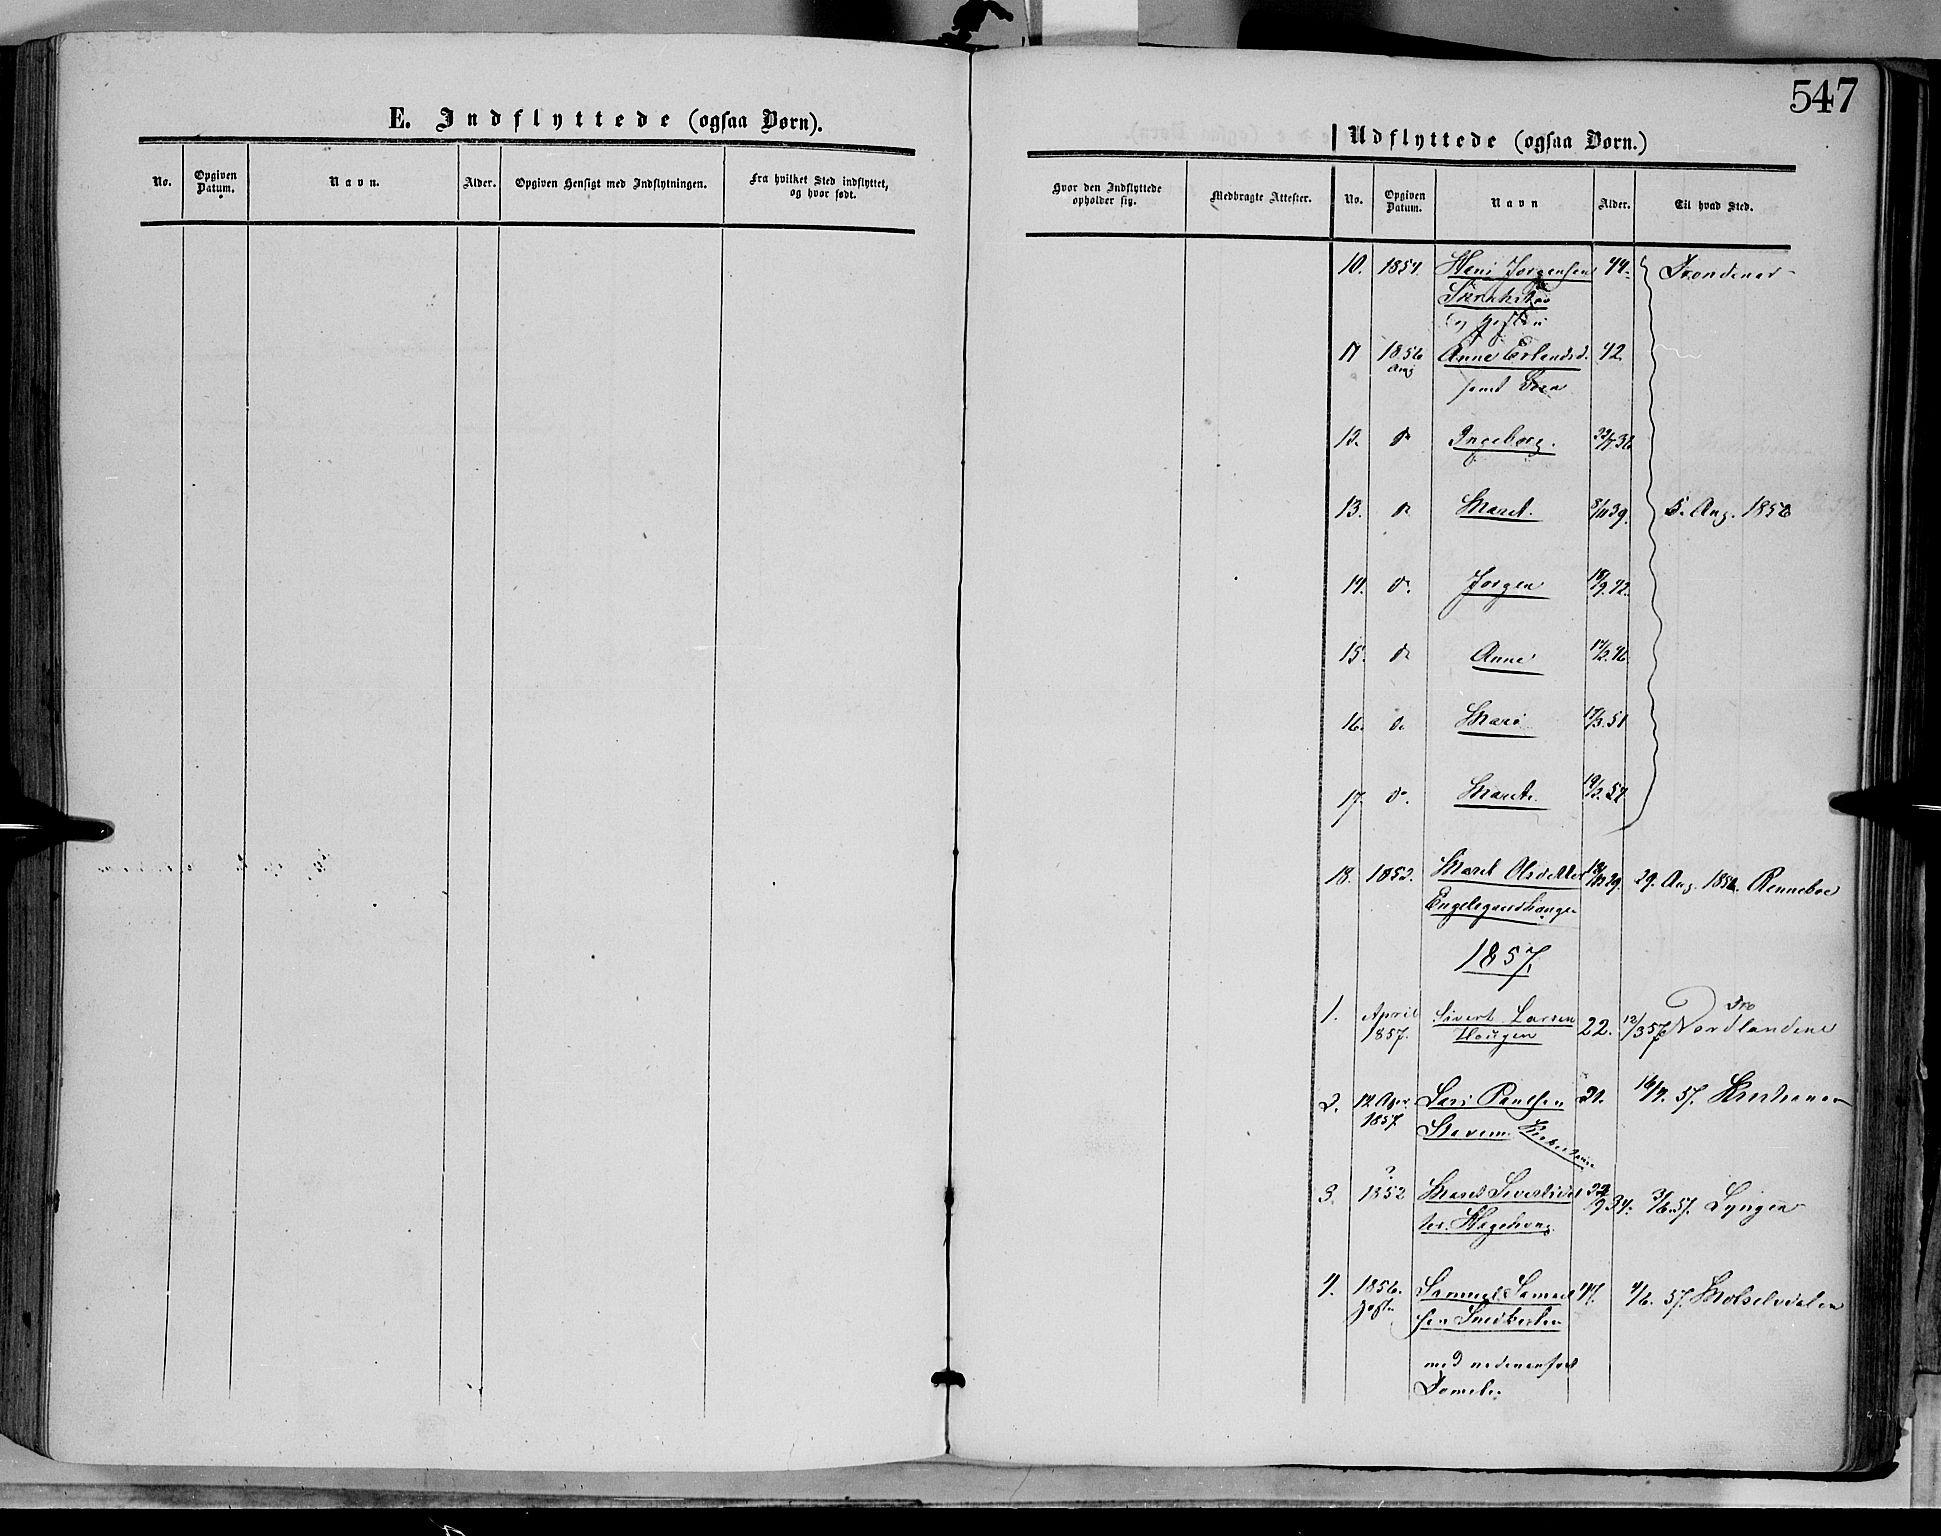 SAH, Dovre prestekontor, Ministerialbok nr. 1, 1854-1878, s. 547